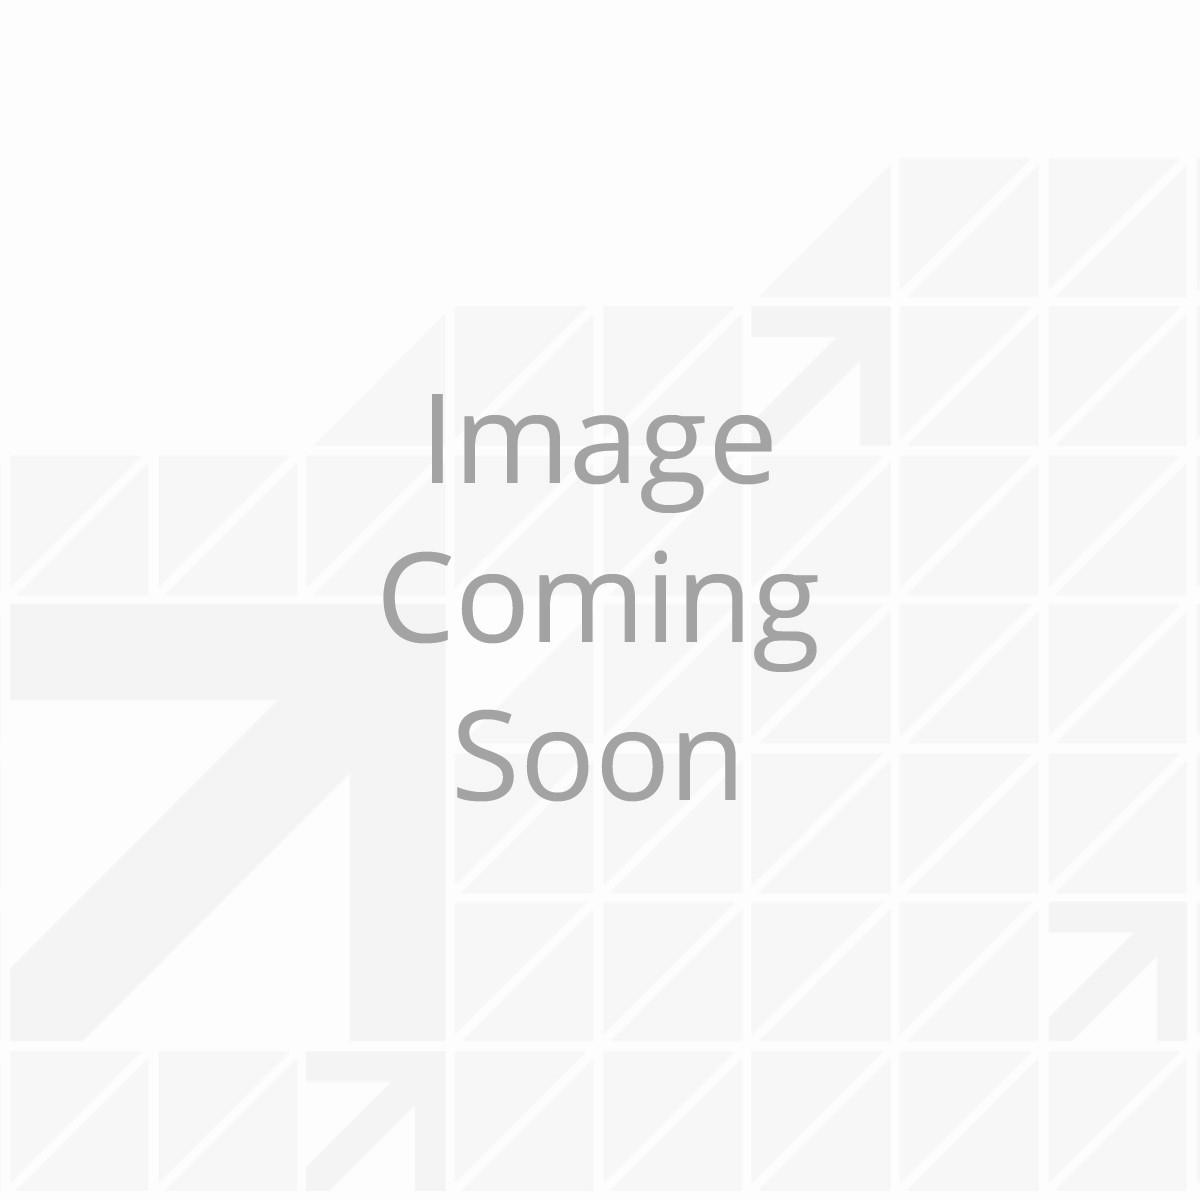 Replacement Swivel Jack Pull-Pin for Bracket-Mount or Marine Jacks